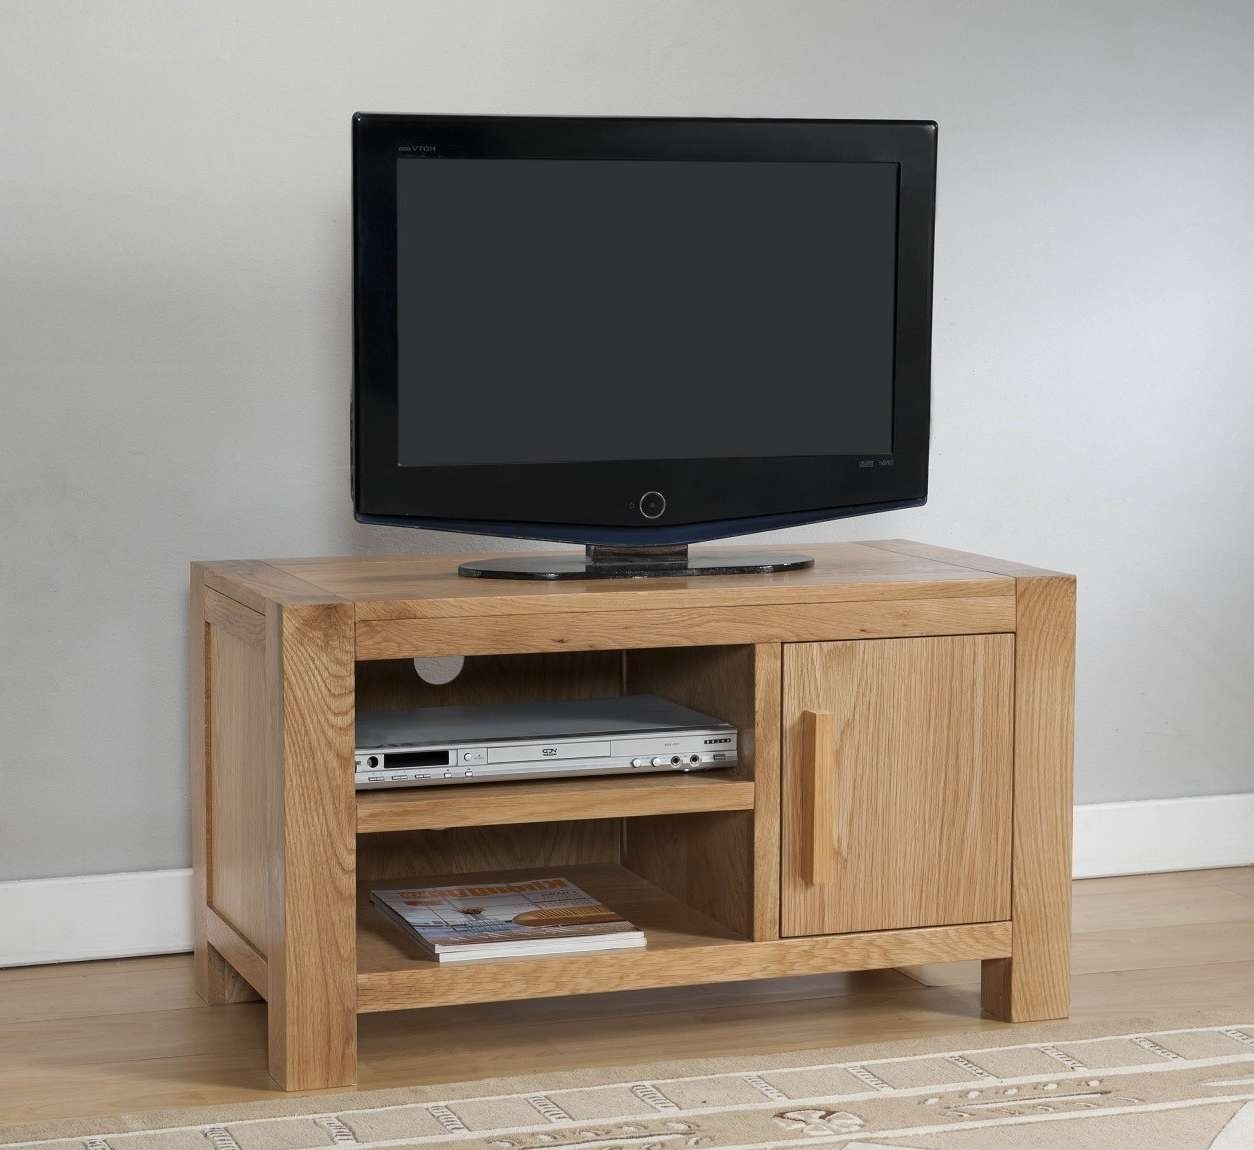 Aylesbury Contemporary Light Oak Small Tv Unit | Oak Furniture Uk Regarding Small Oak Tv Cabinets (View 20 of 20)